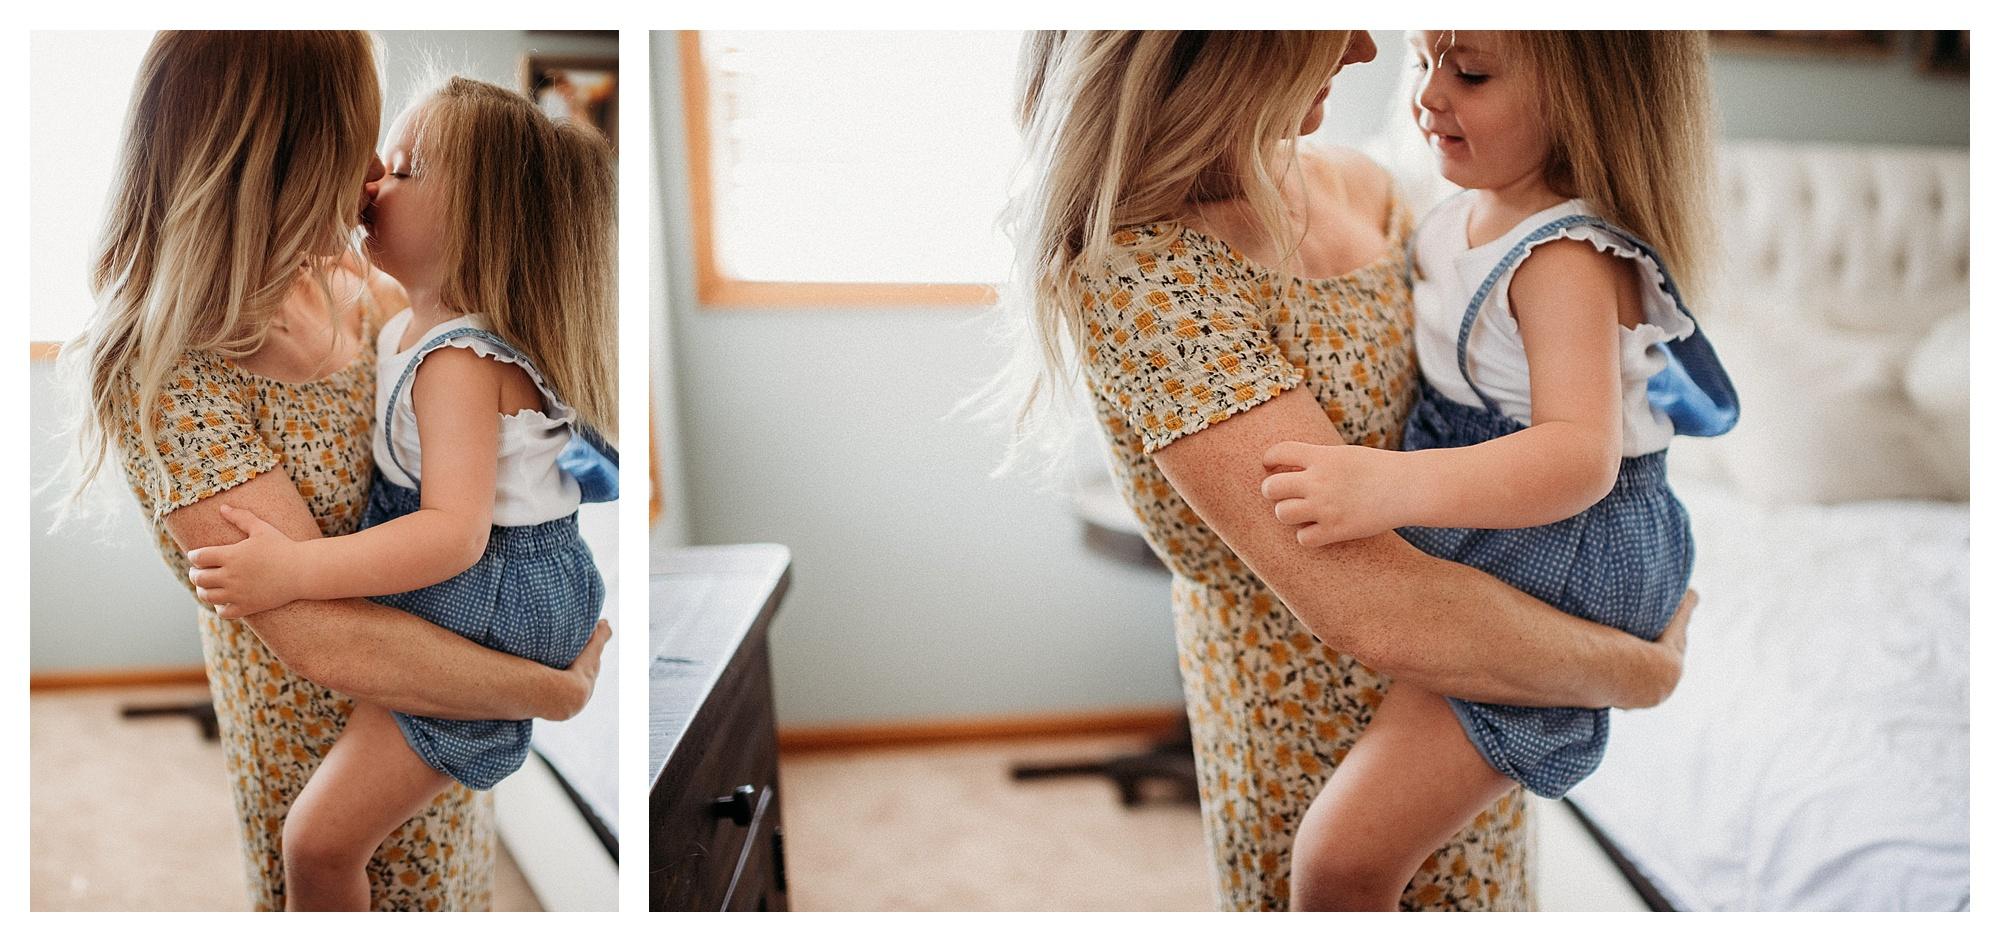 lake county family photographer, mommy and me, motherhood, lifestyle, bella nicole photography, hawthorne woods photographer, chicago photographer, illinois photographer, chicago, in home photos, affordable photorgapher, children